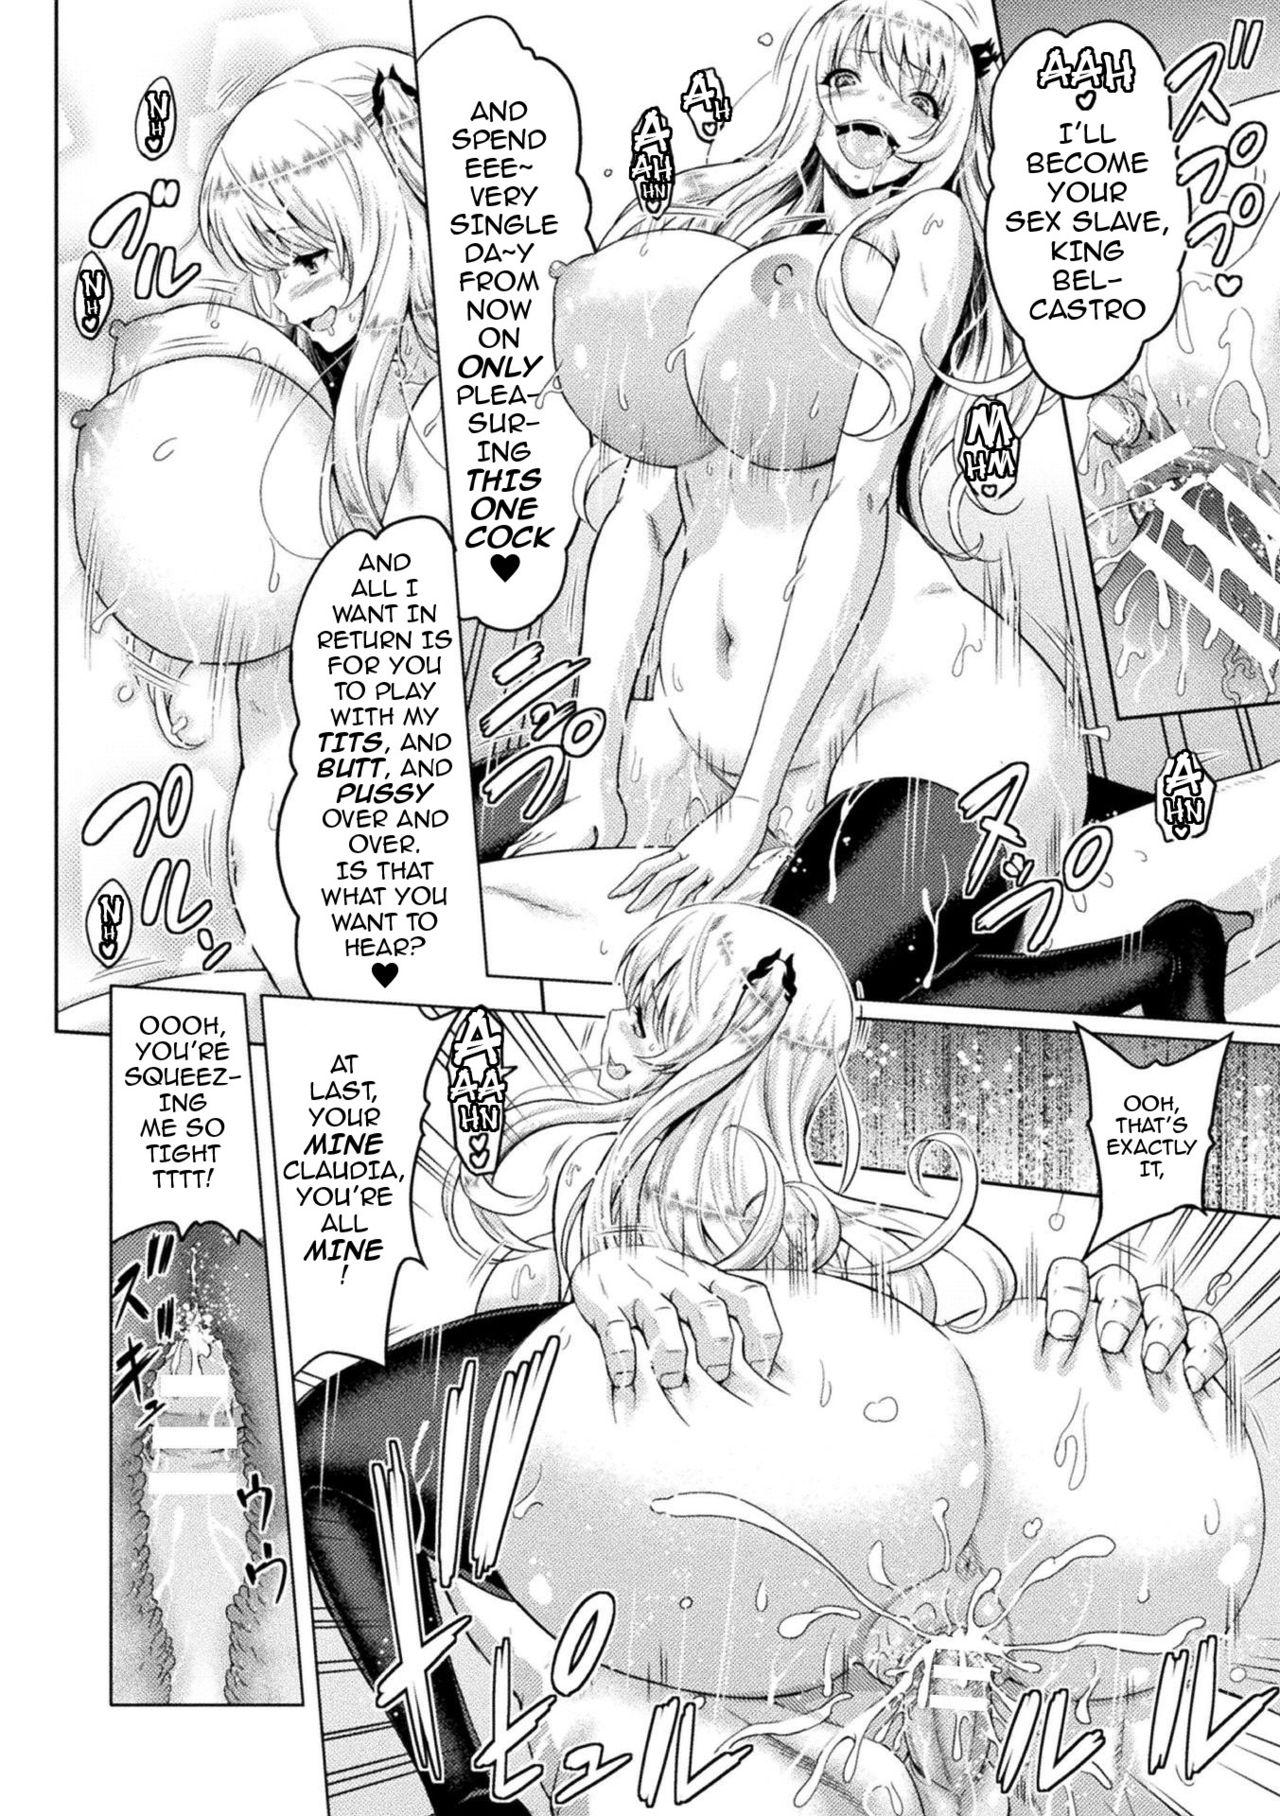 [Yamada Gogogo] Erona ~Orc no Inmon ni Okasareta Onna Kishi no Matsuro~ | Erona ~The Fall of a Beautiful Knight Cursed with the Lewd Mark of an Orc~ [English] {darknight} 92